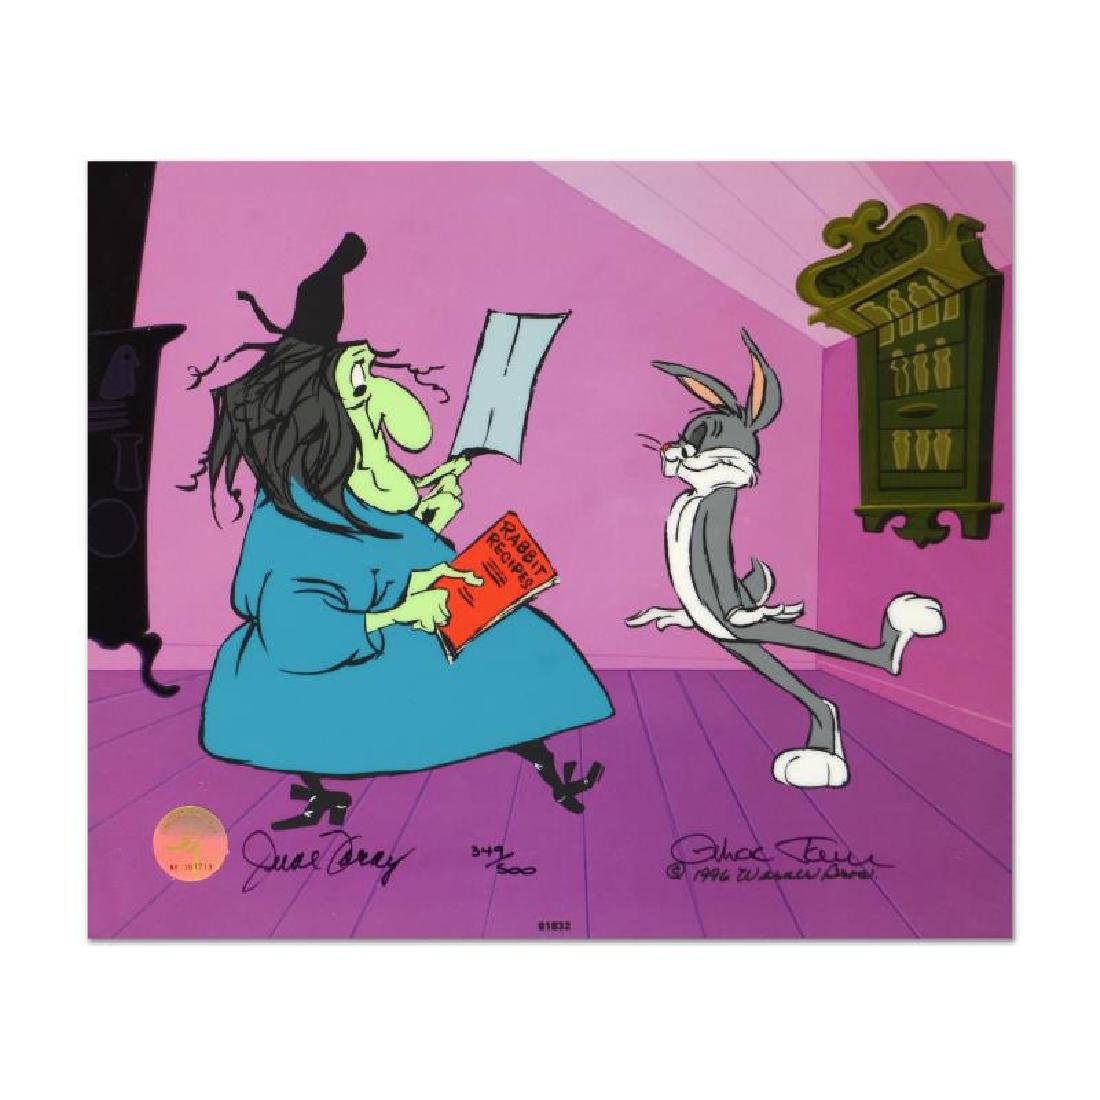 Rabbit Recipes by Chuck Jones (1912-2002)